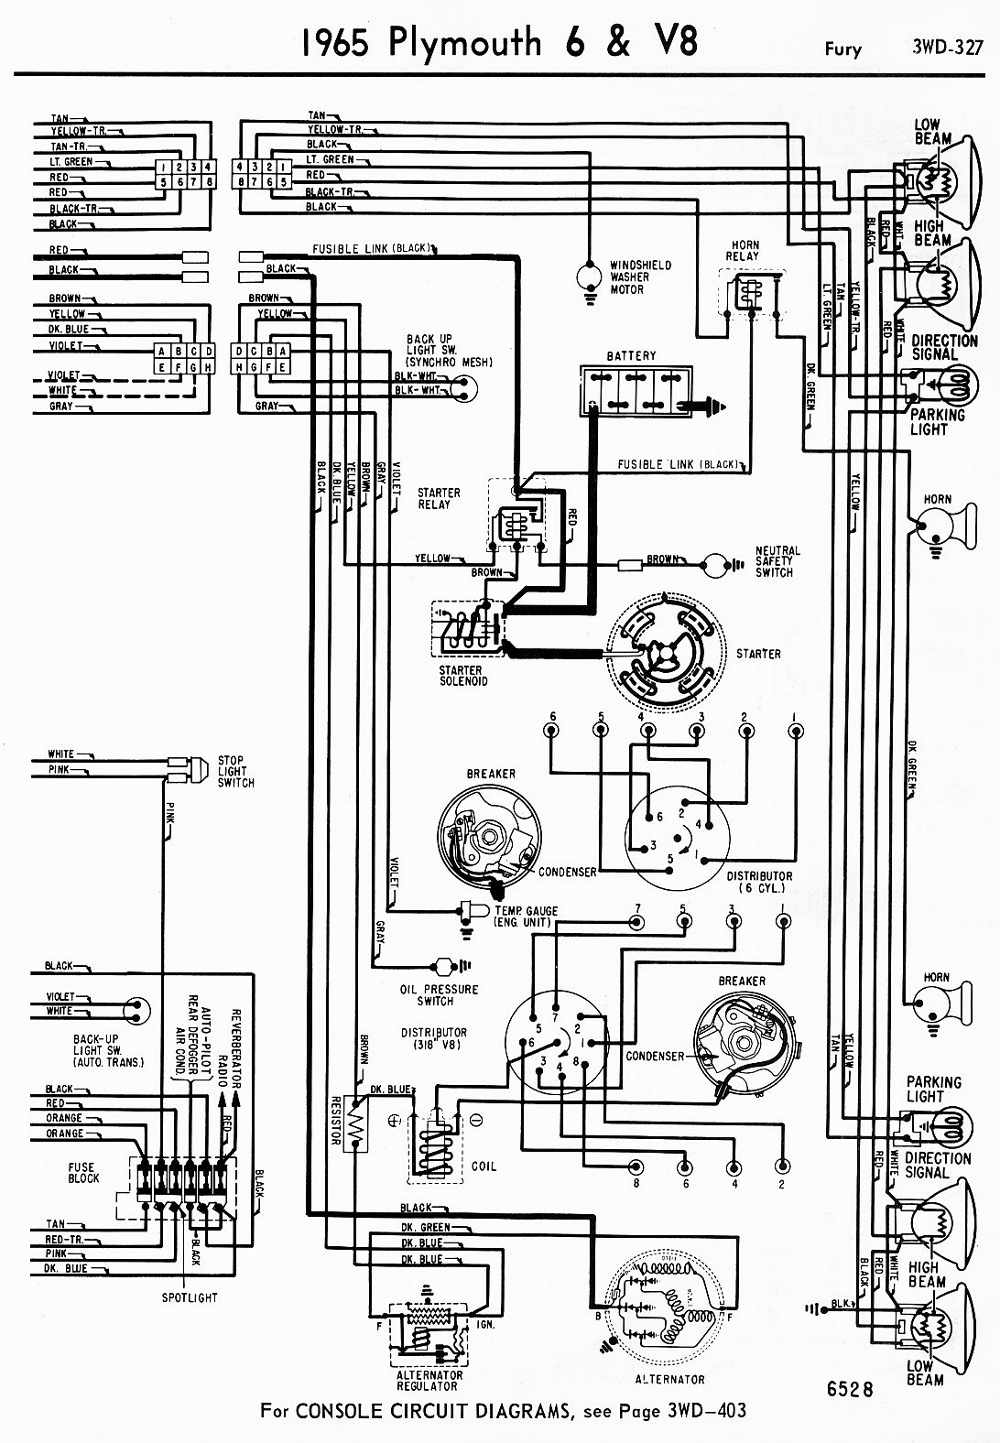 1969 plymouth fury convertible wiring diagram not lossing wiring 69 plymouth fury wiring diagram completed wiring diagrams rh 9 schwarzgoldtrio de 1966 plymouth fury convertible 1966 plymouth fury convertible